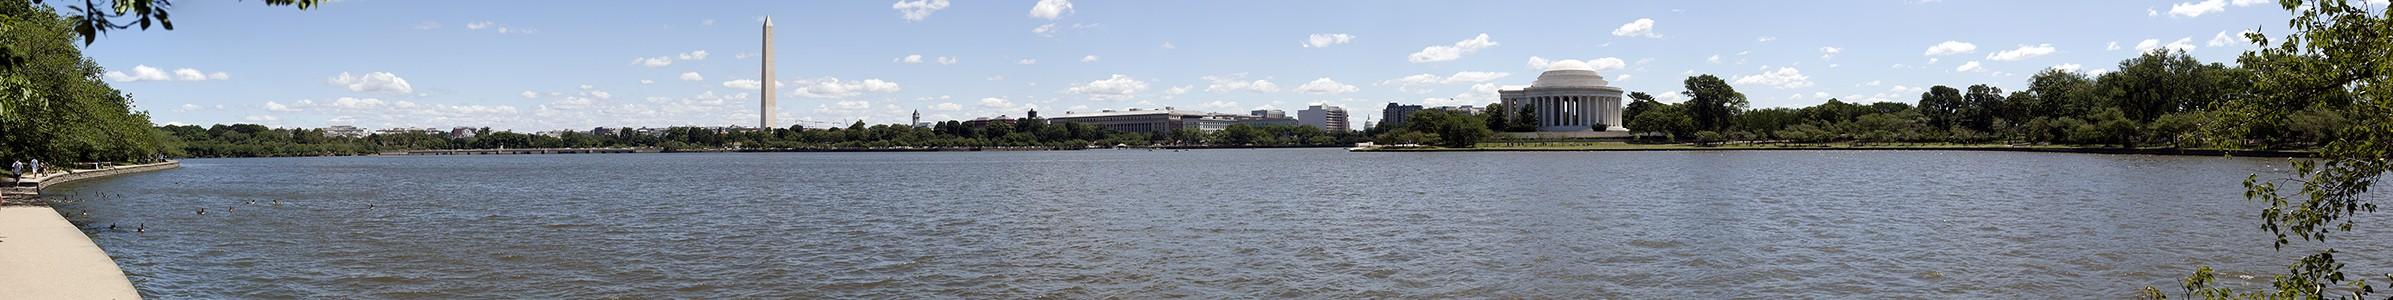 Washington, D.C. West Potomac Park: Tidal Basin, Washington Monument, Jefferson Memorial